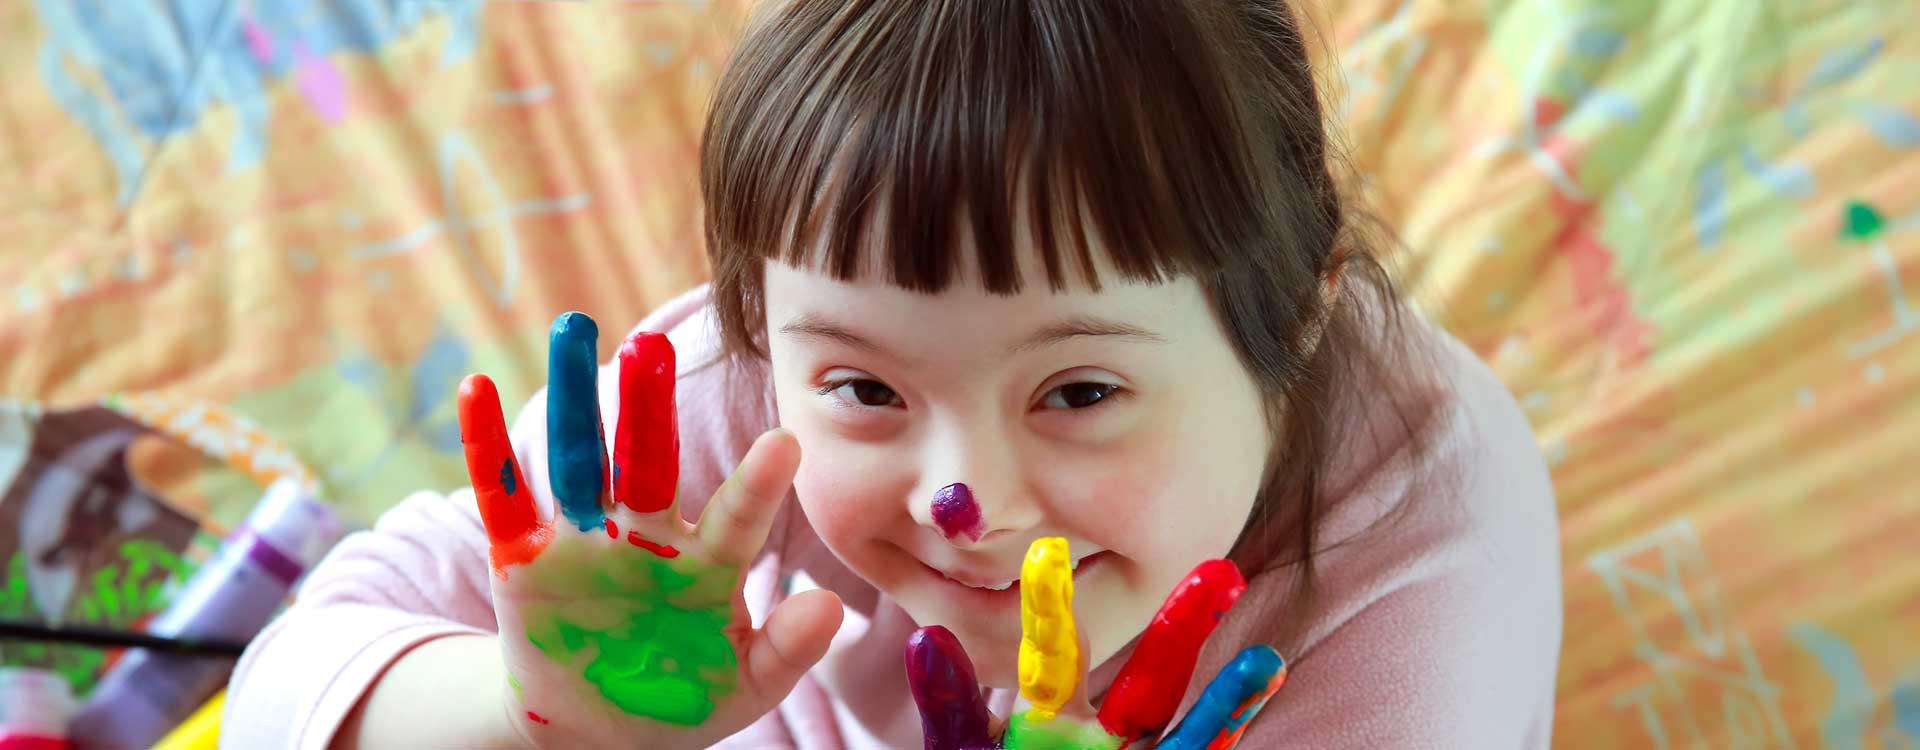 Child Hand Paint